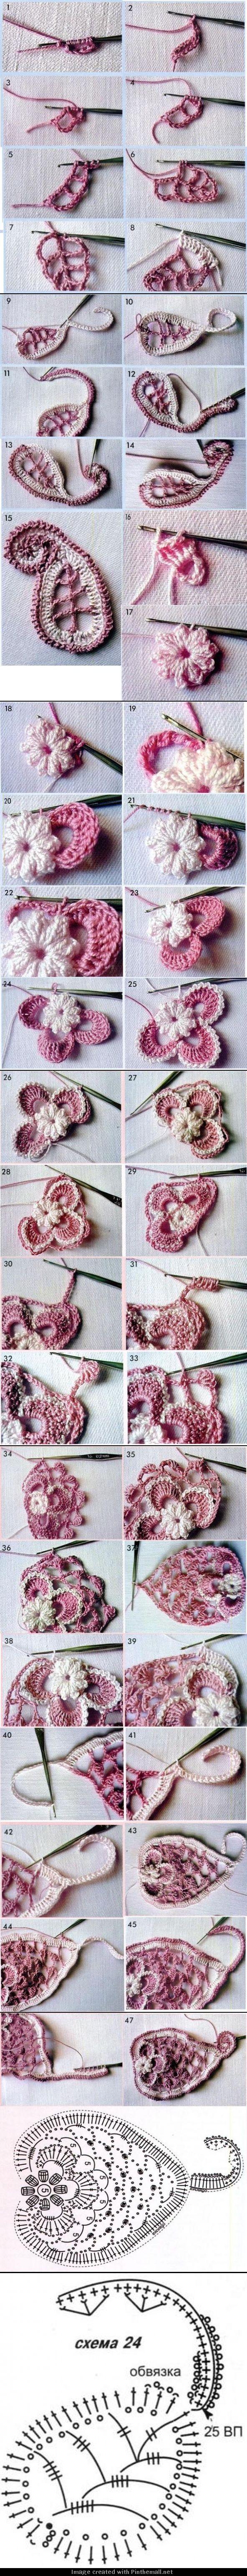 More divine irish crochet lace; - created via http://pinthemall.net